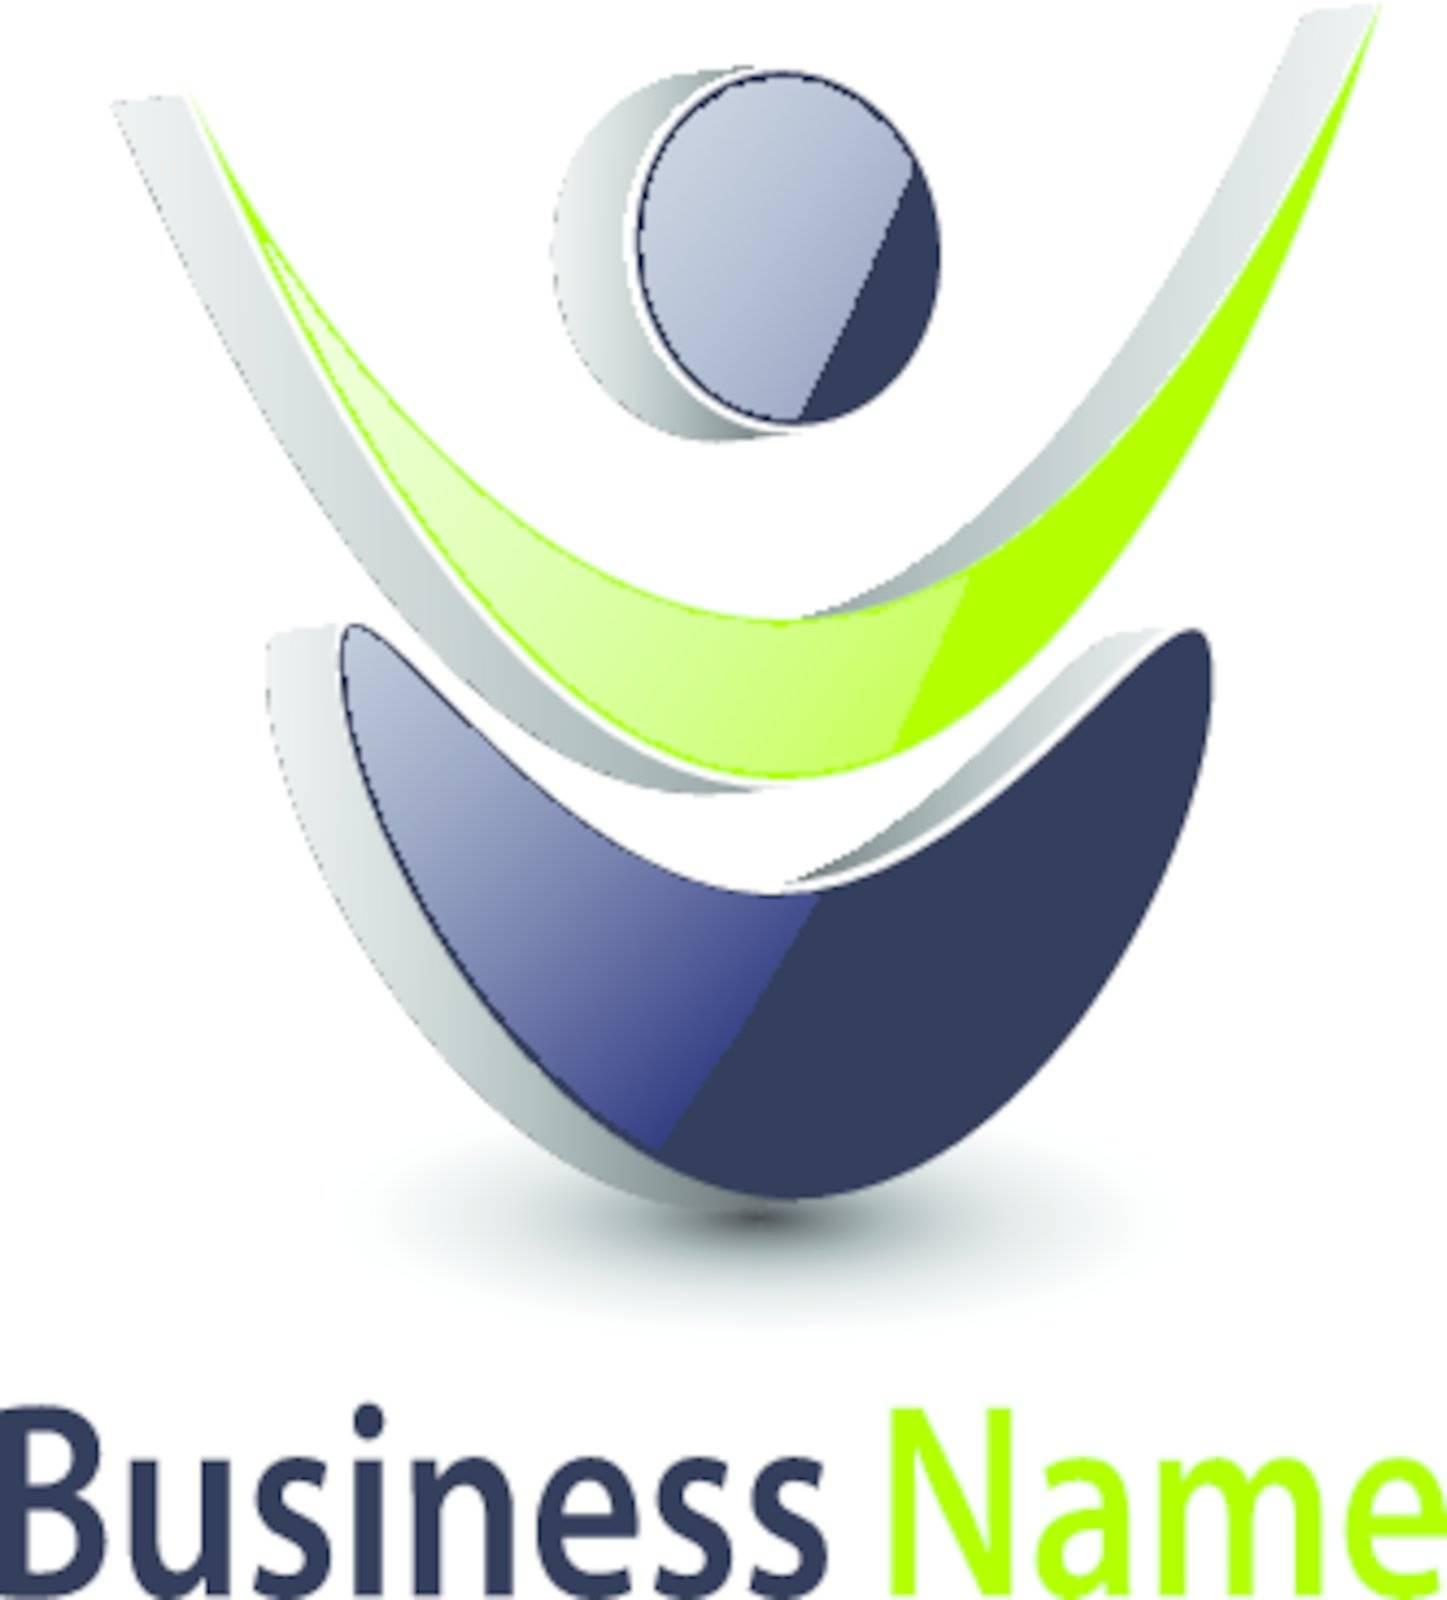 Logo abstract dynamic human shape,  grey and green.